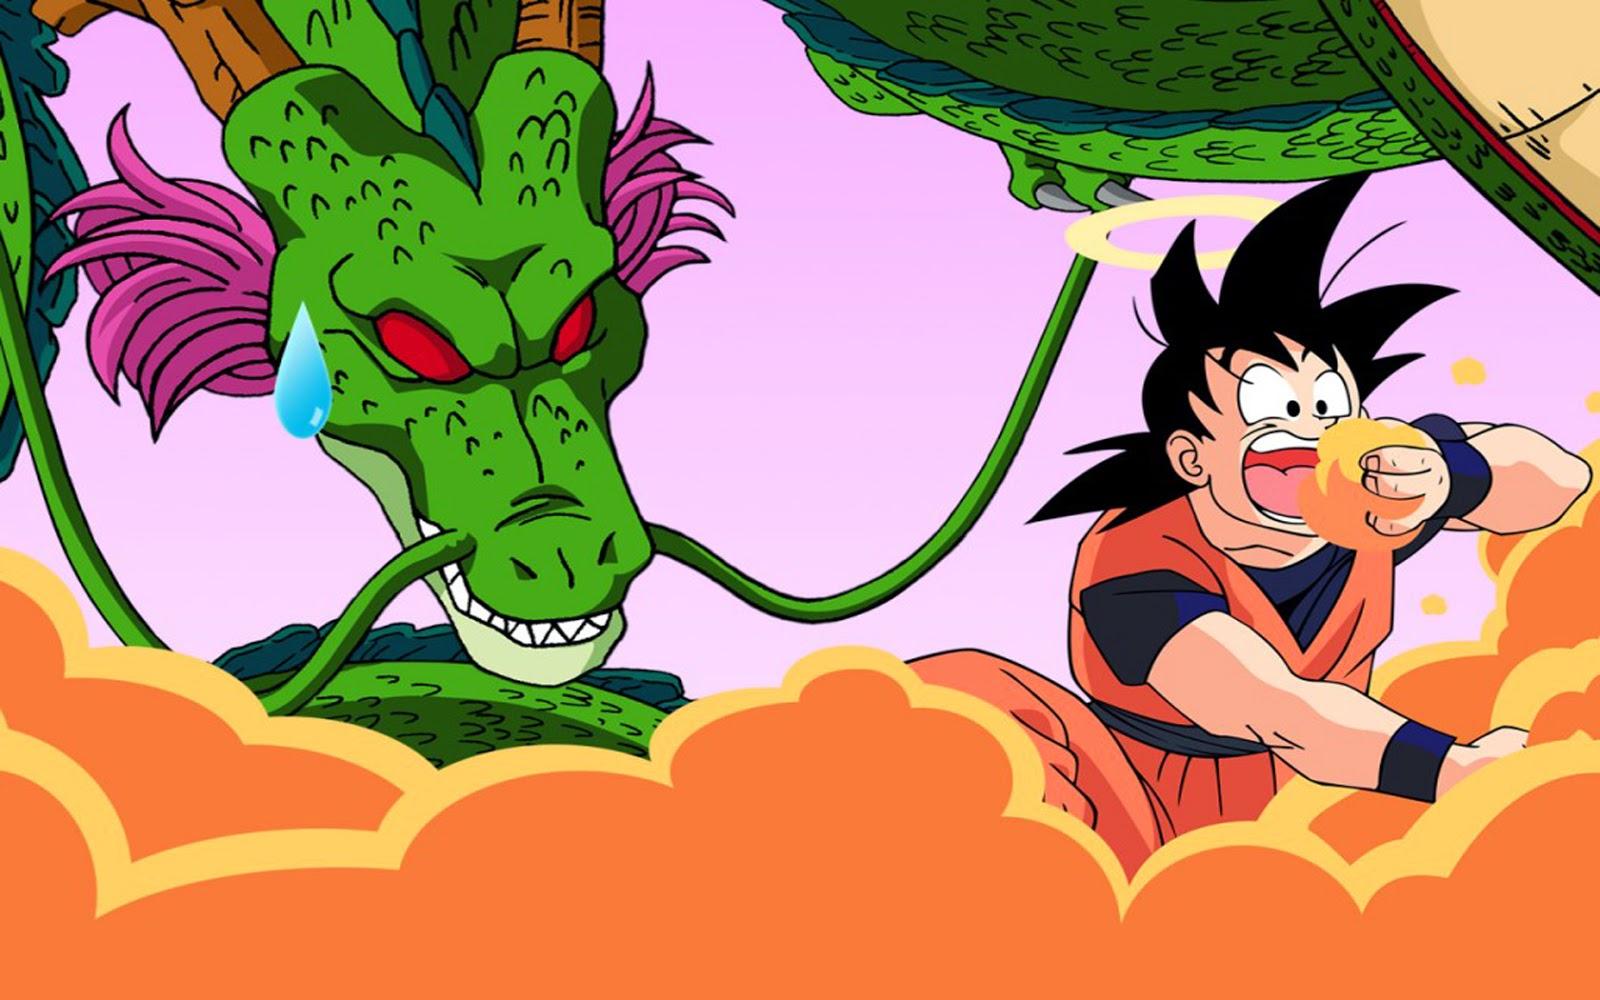 Imagenesde99 Imagenes De Goku Fase 10 Para Descargar: Imagenesde99: Imagenes Movibles De Goku